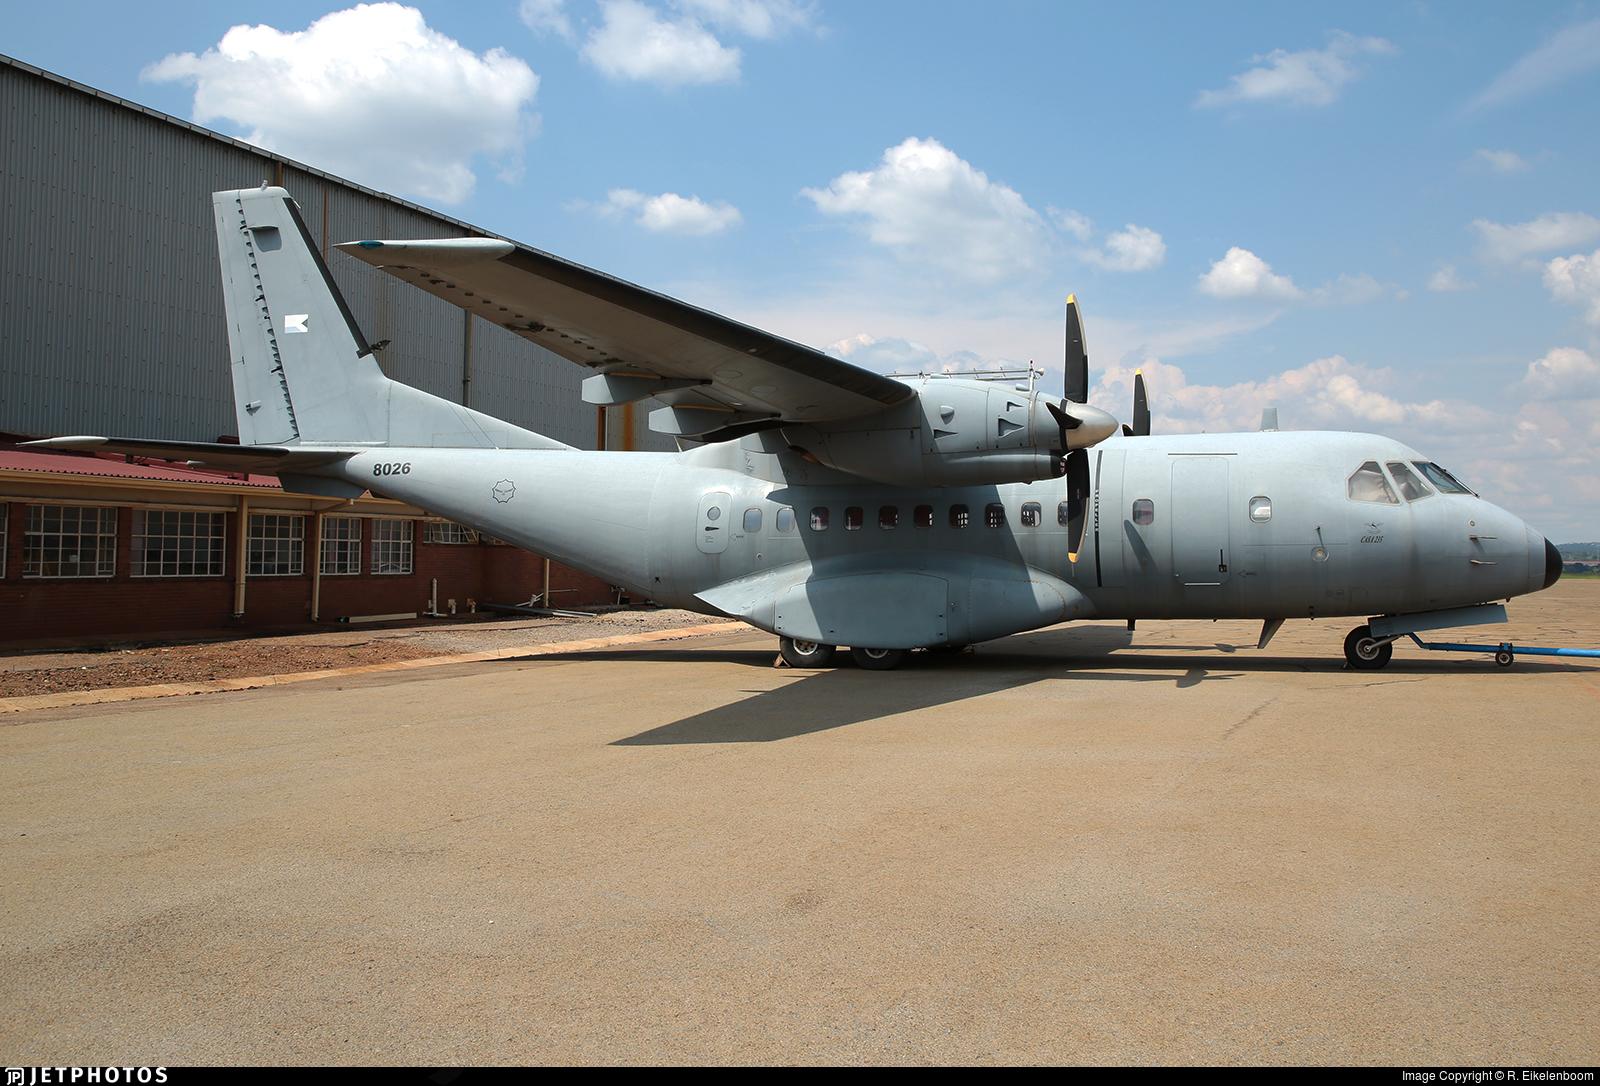 8026 - CASA CN-235-10 - South Africa - Air Force